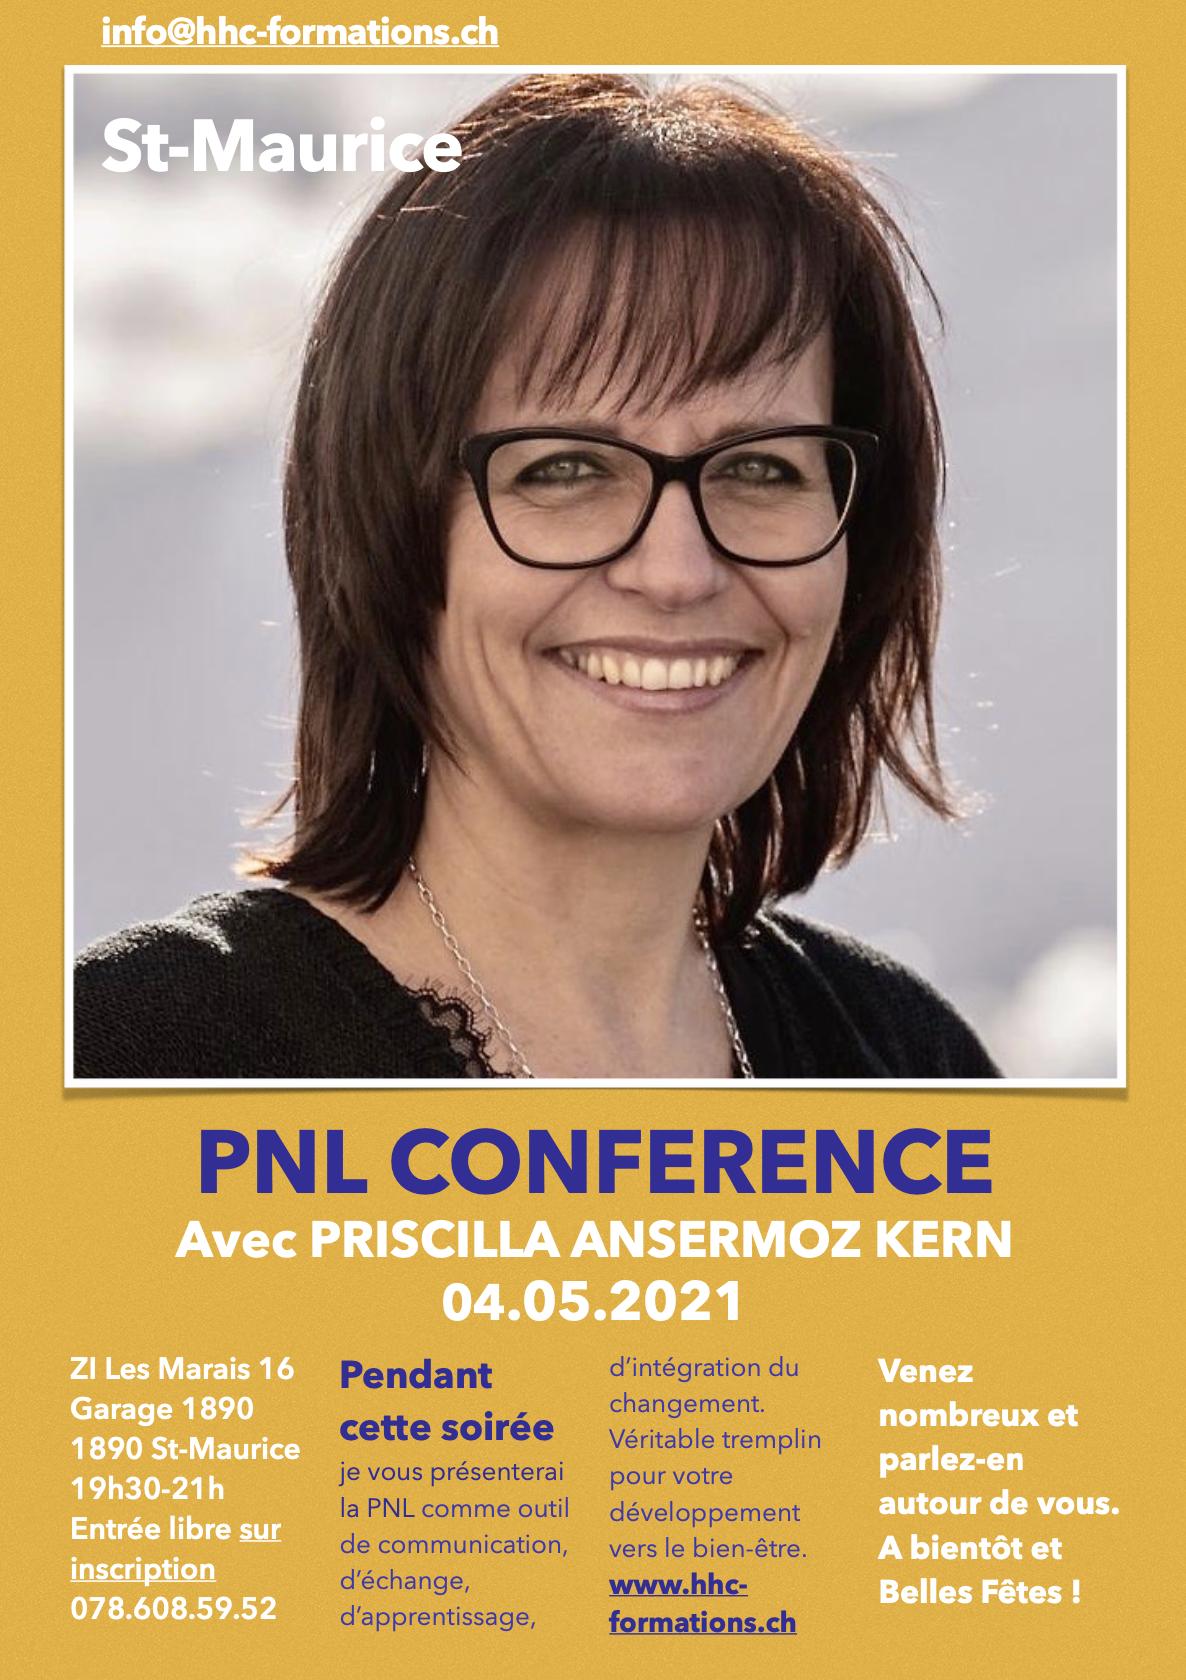 PNL, Conférence du 05 mai 2021 à St-Maurice